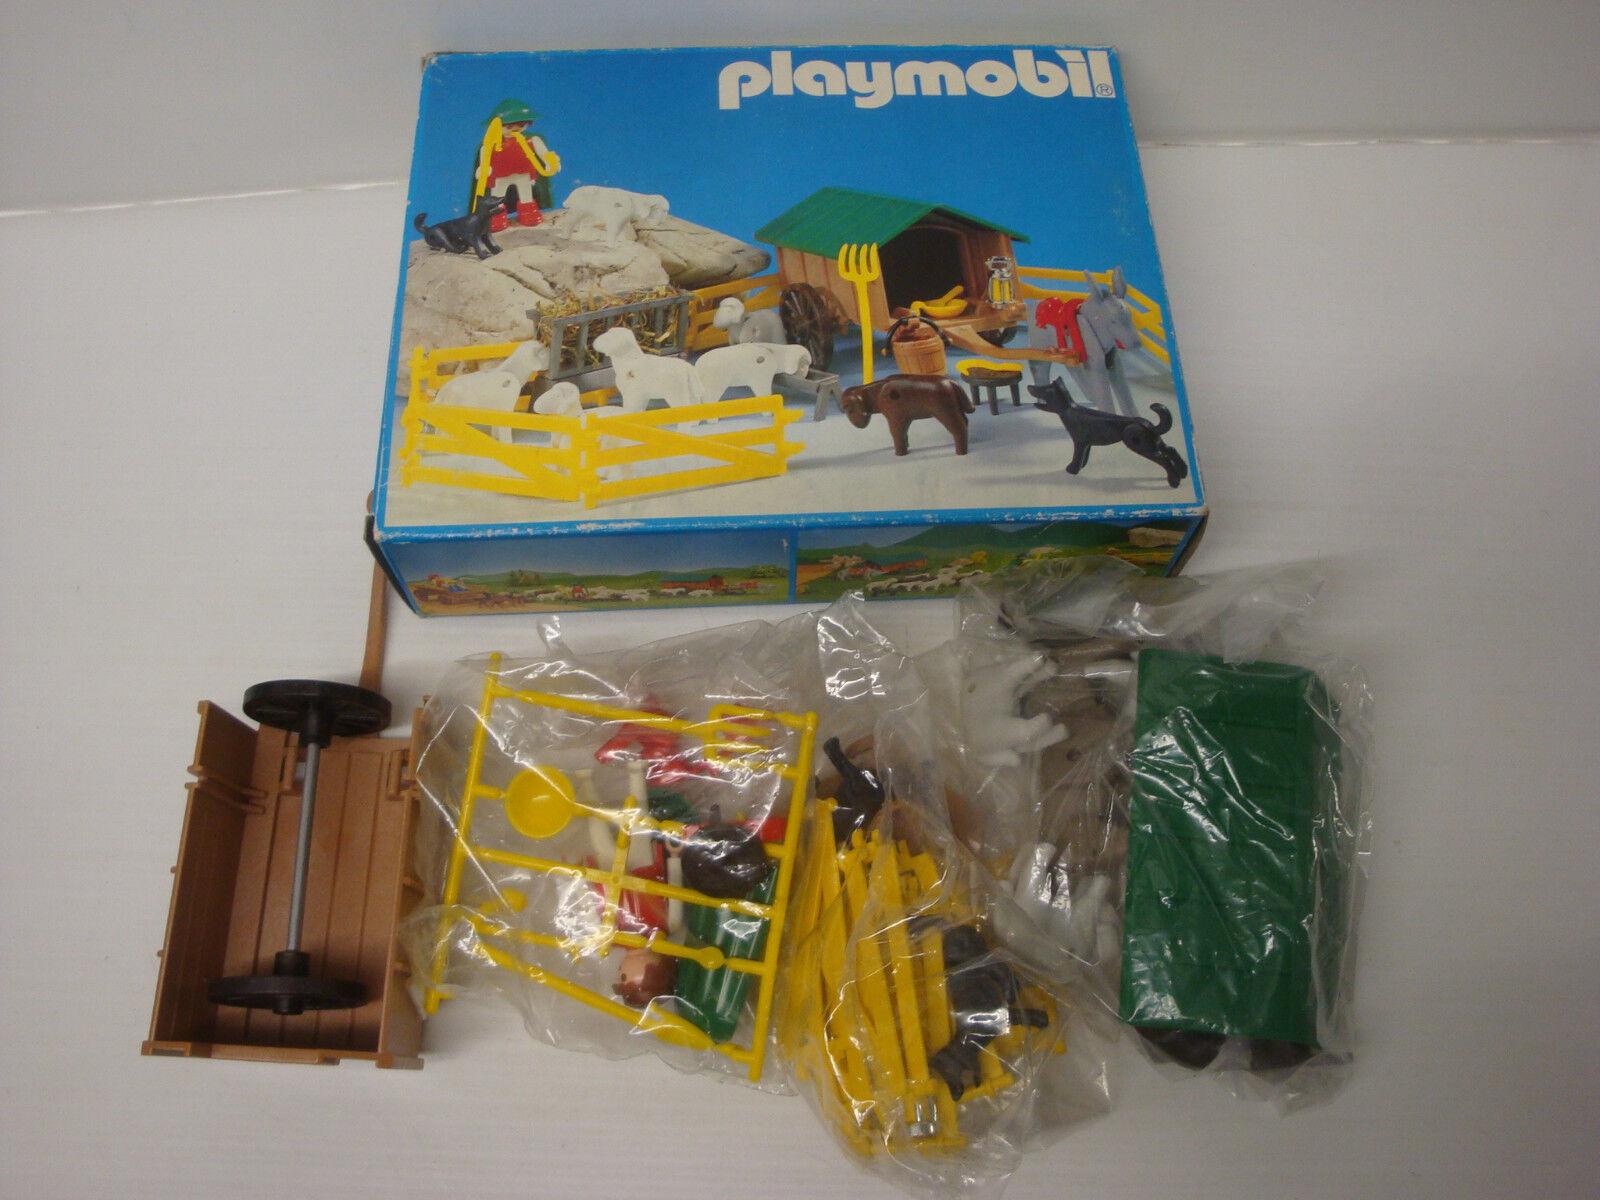 Playmobil ancien état neuf en boite boite boite sachet scellé - set berger & moutons 3412 27c755